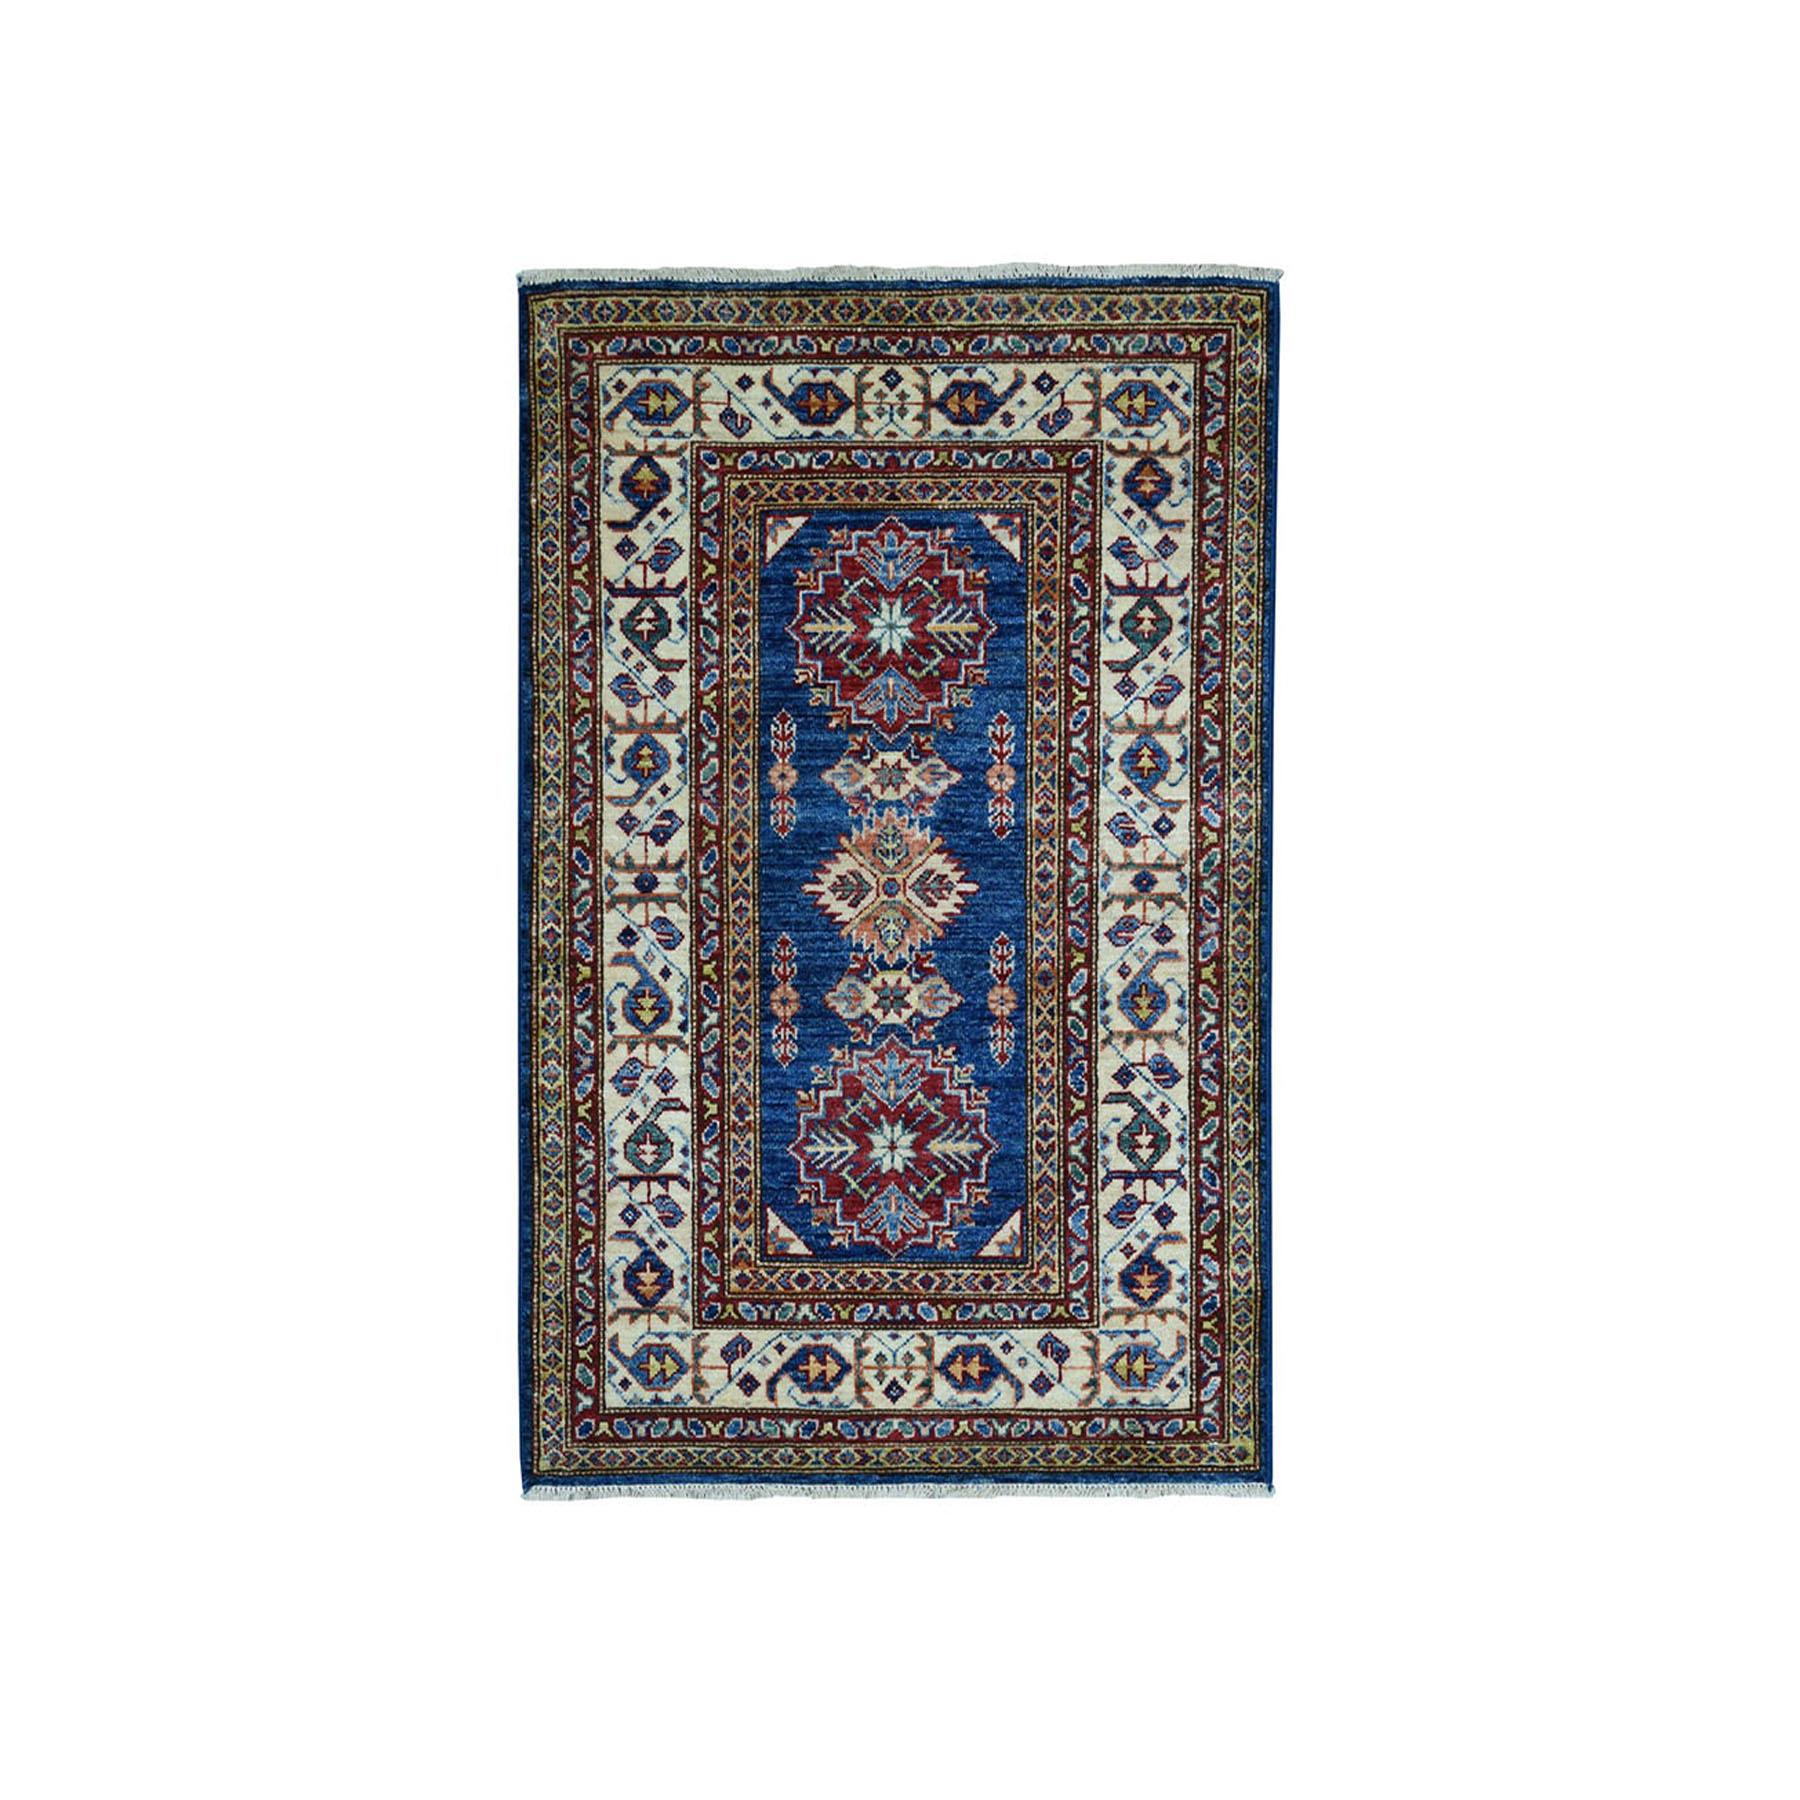 3'X4' Blue Super Kazak Pure Wool Geometric Design Hand-Knotted Oriental Rug moae09d0